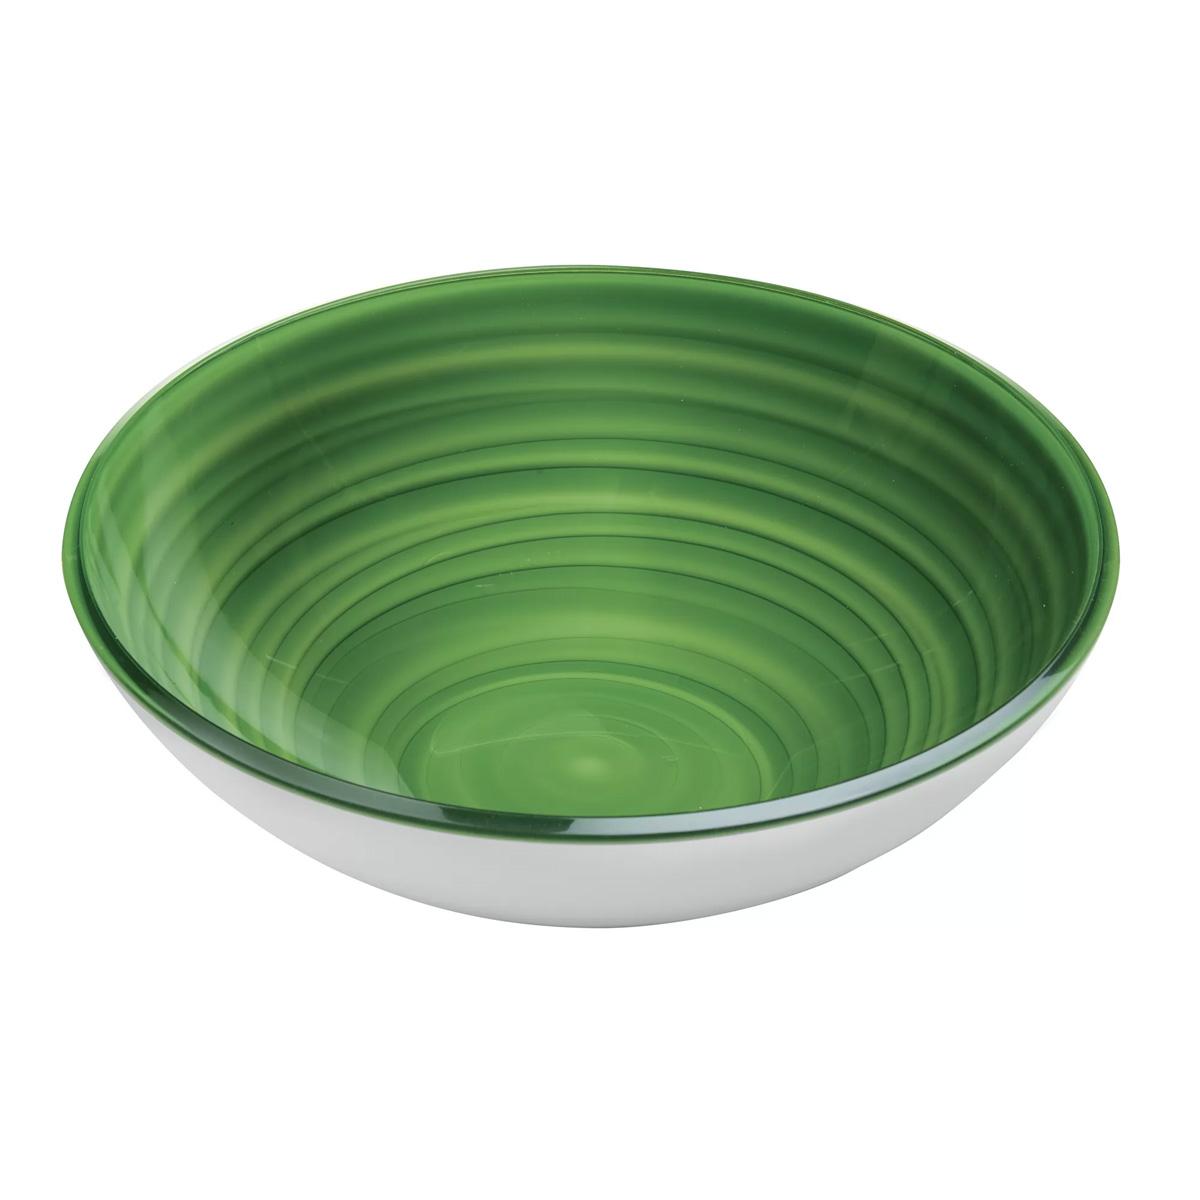 Činija Twist L 1816.28.153 zelena